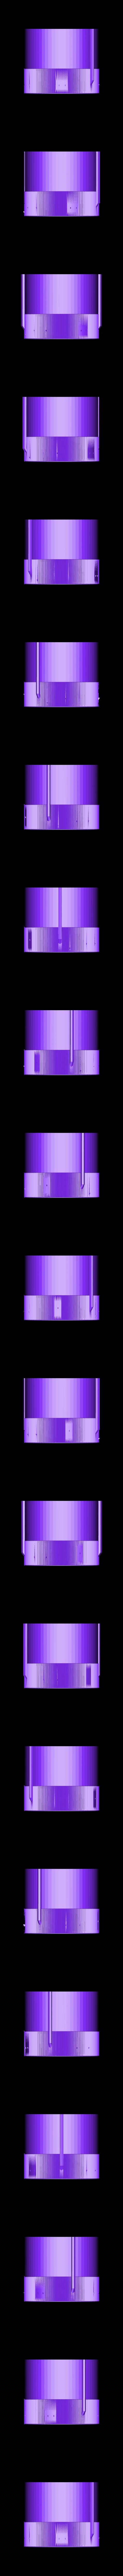 S-I top part a.stl Download free STL file Saturn V Rocket - Stage 1 • 3D printable template, spac3D